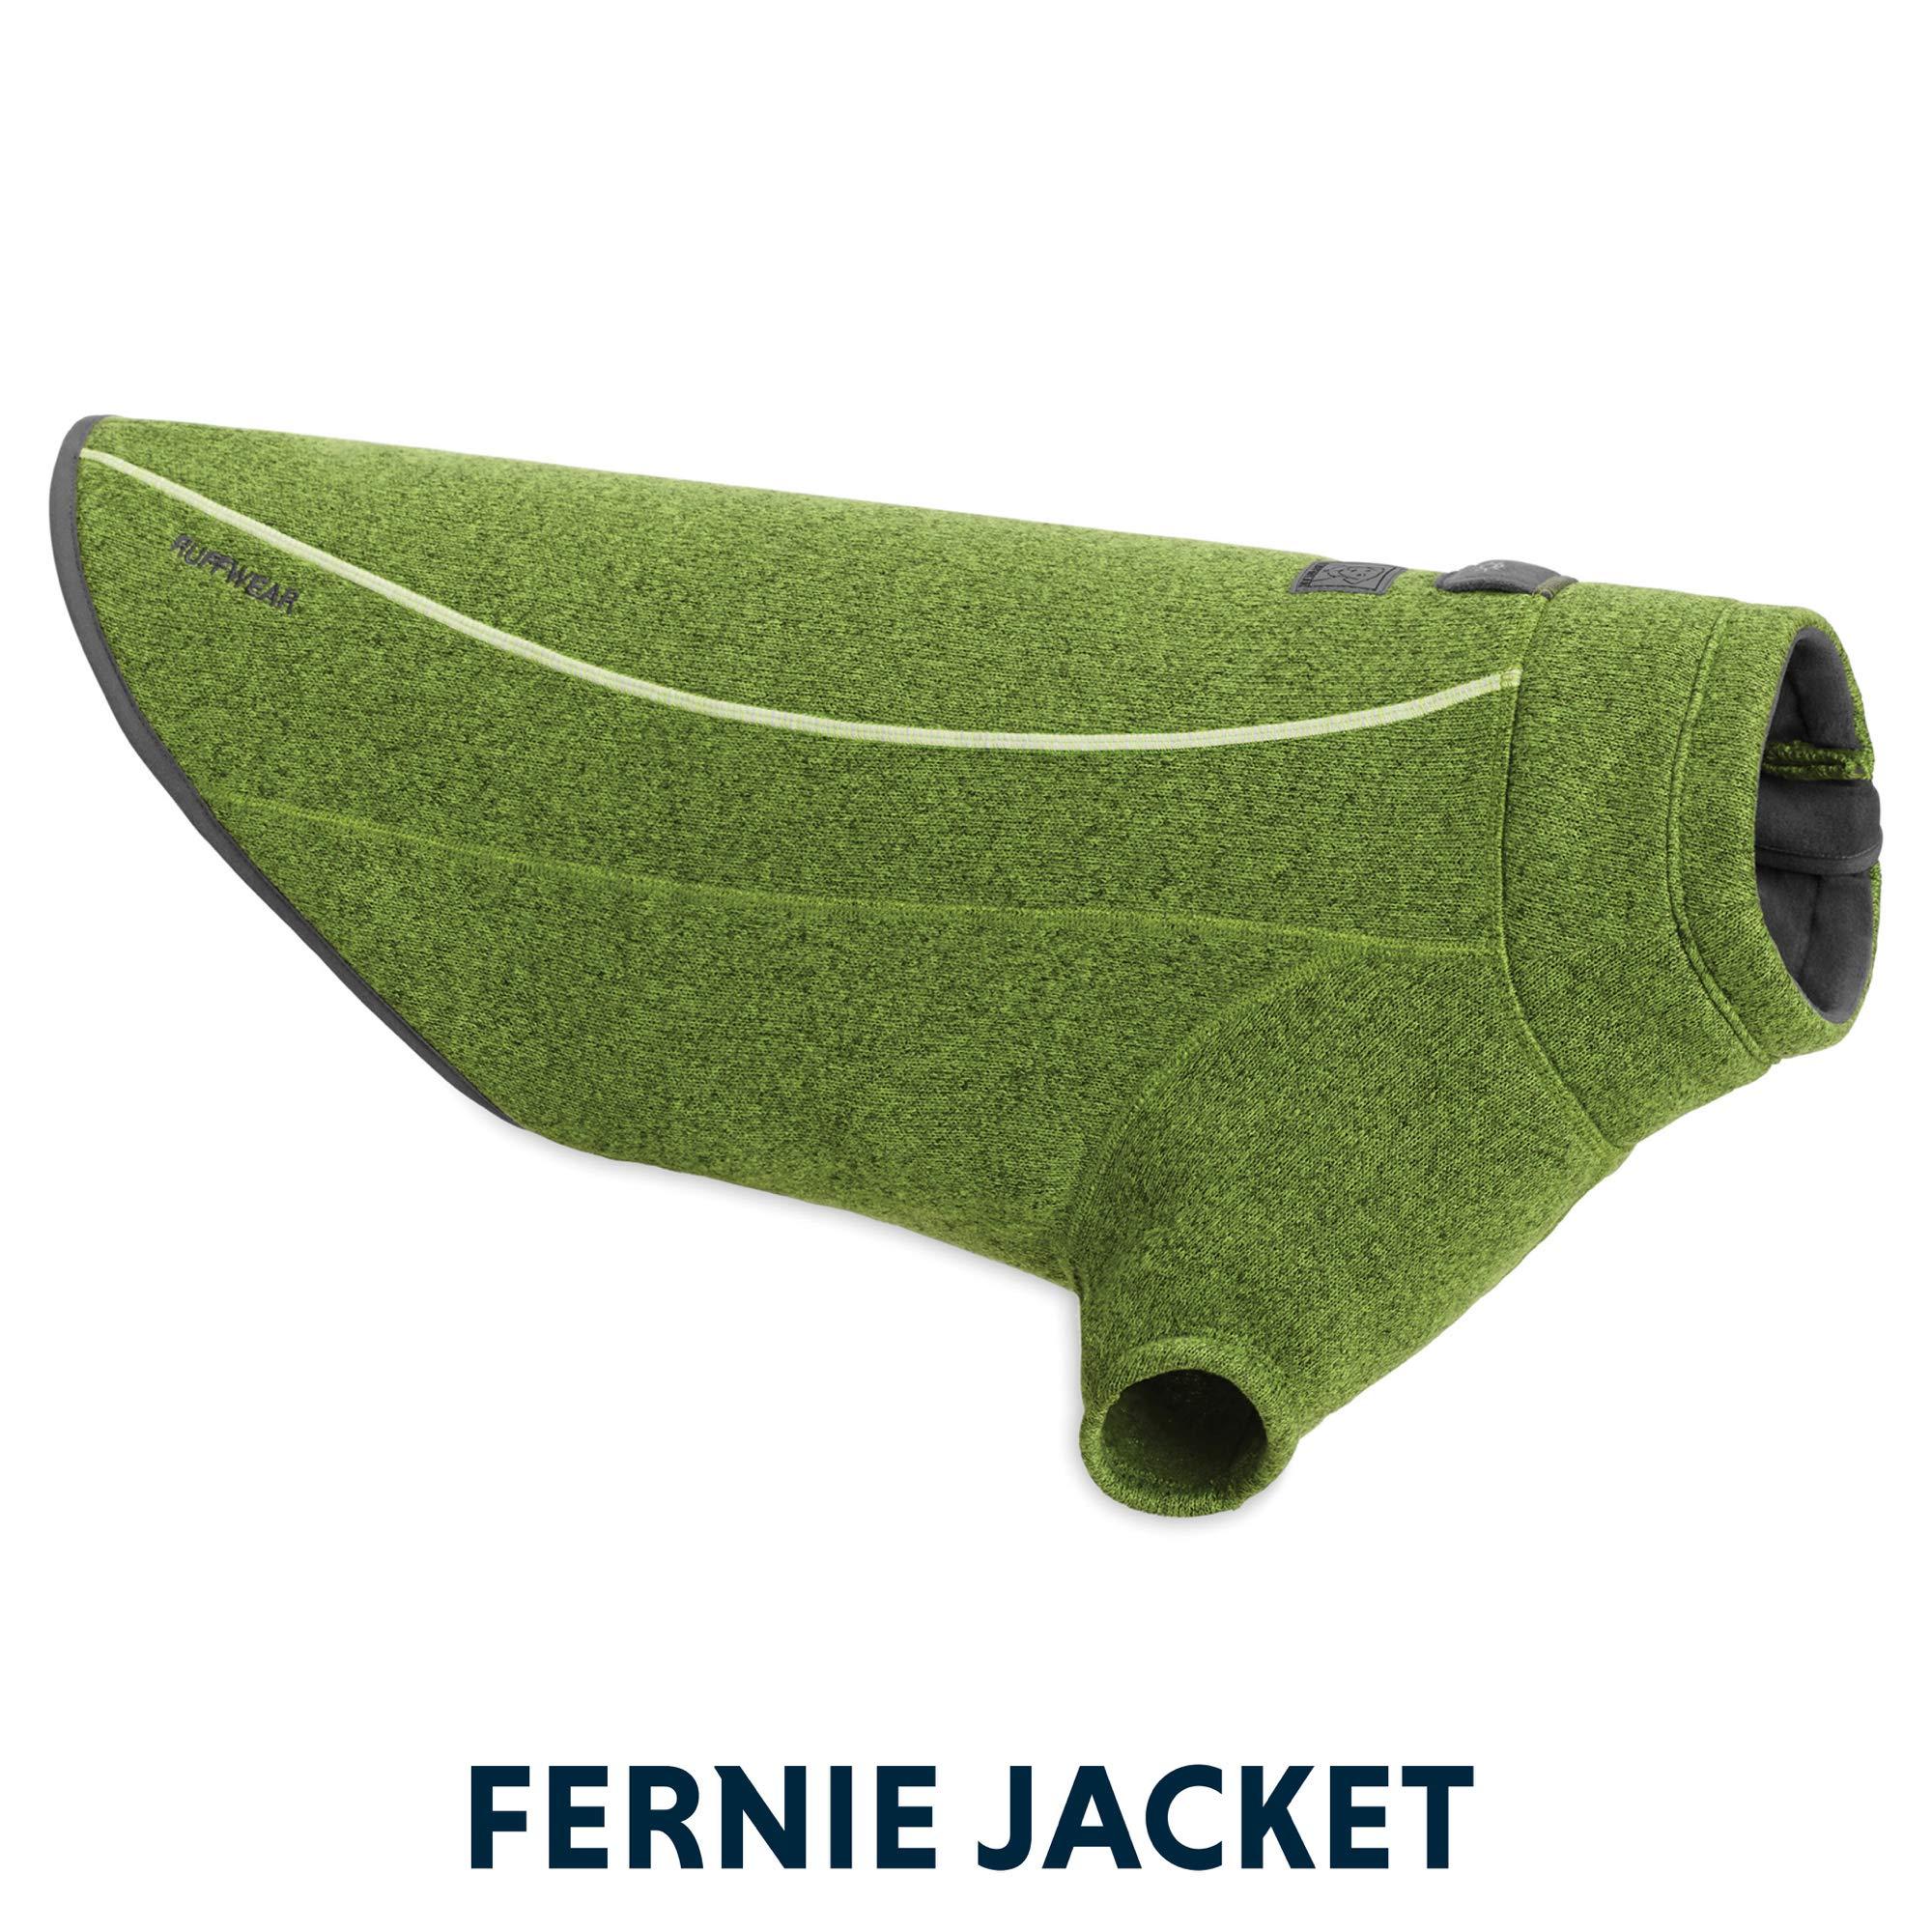 RUFFWEAR - Fernie, Hemlock Green, Small